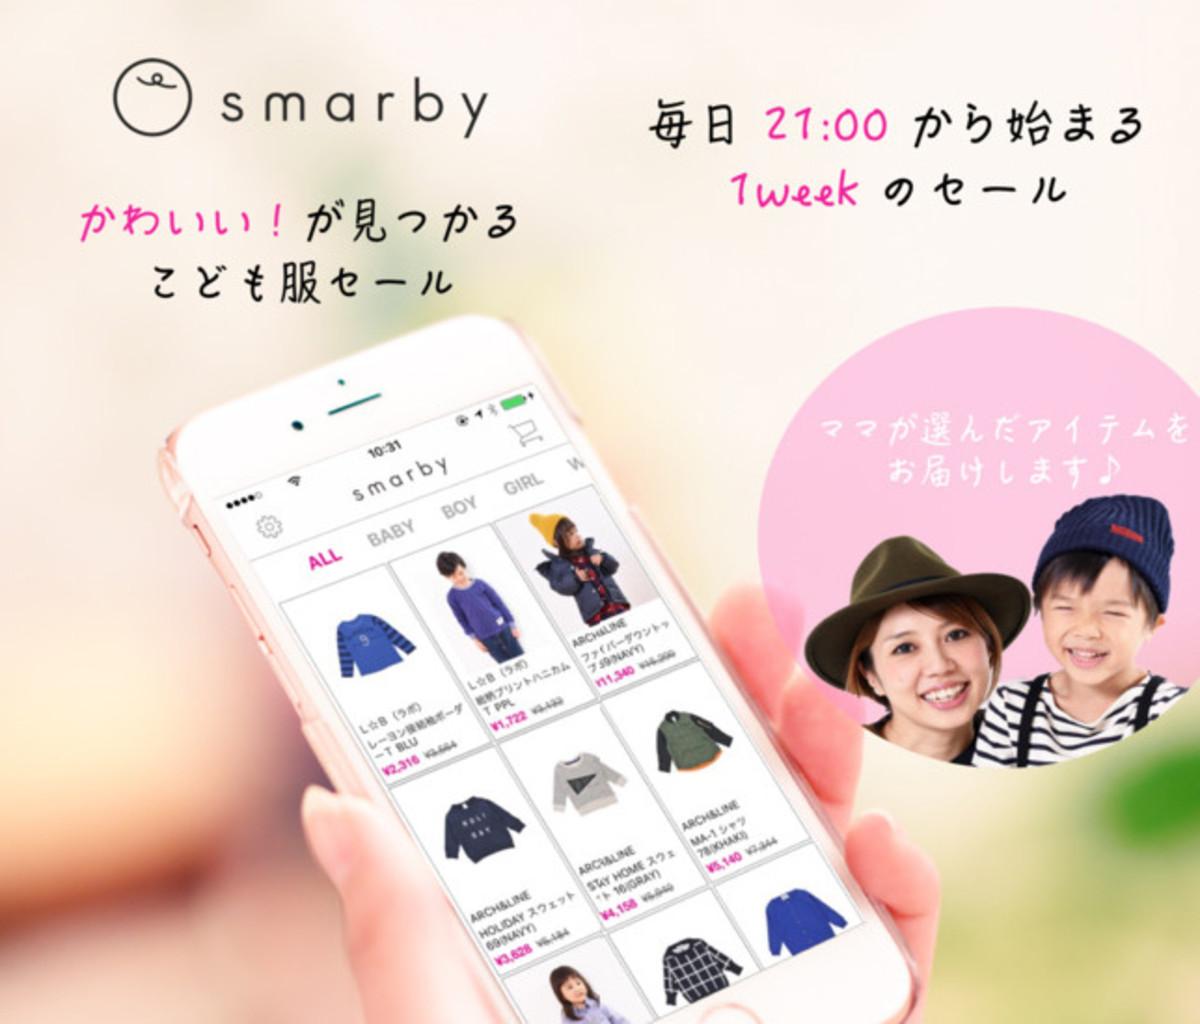 smarby(スマービー)は子供服&雑貨がセール価格で買えるアプリ